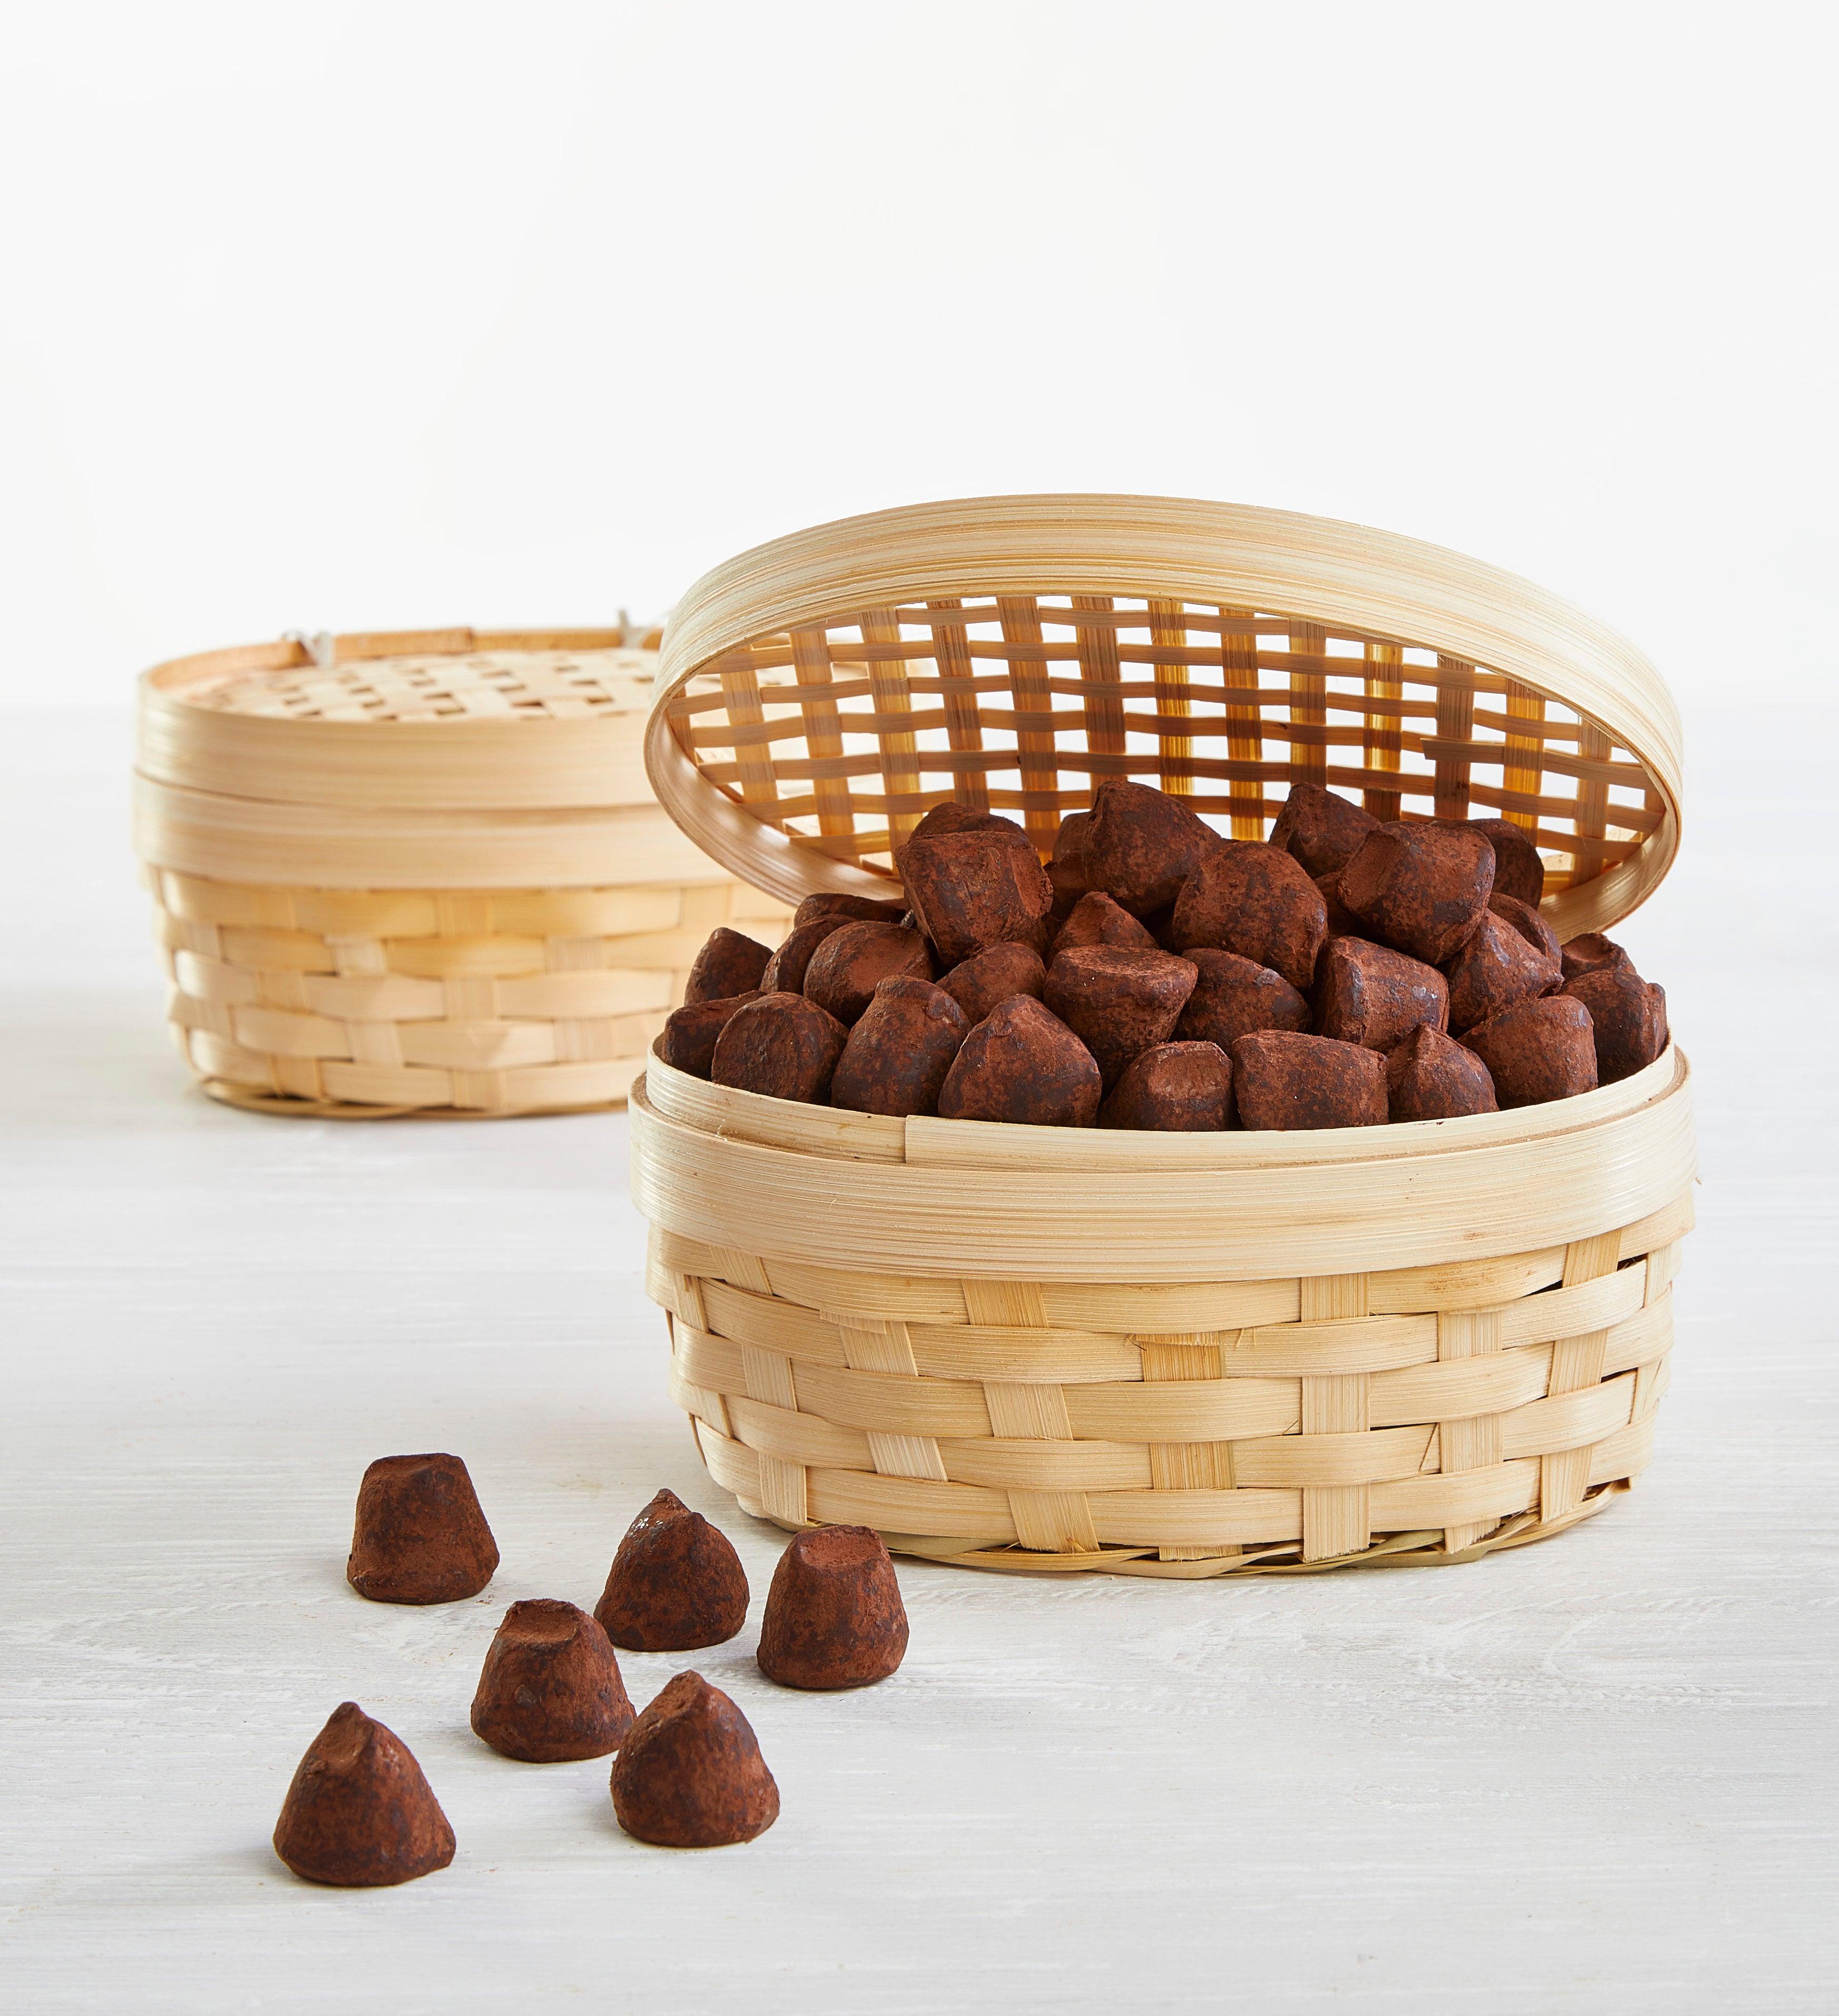 Guyaux Classic French Chocolate Truffle Basket